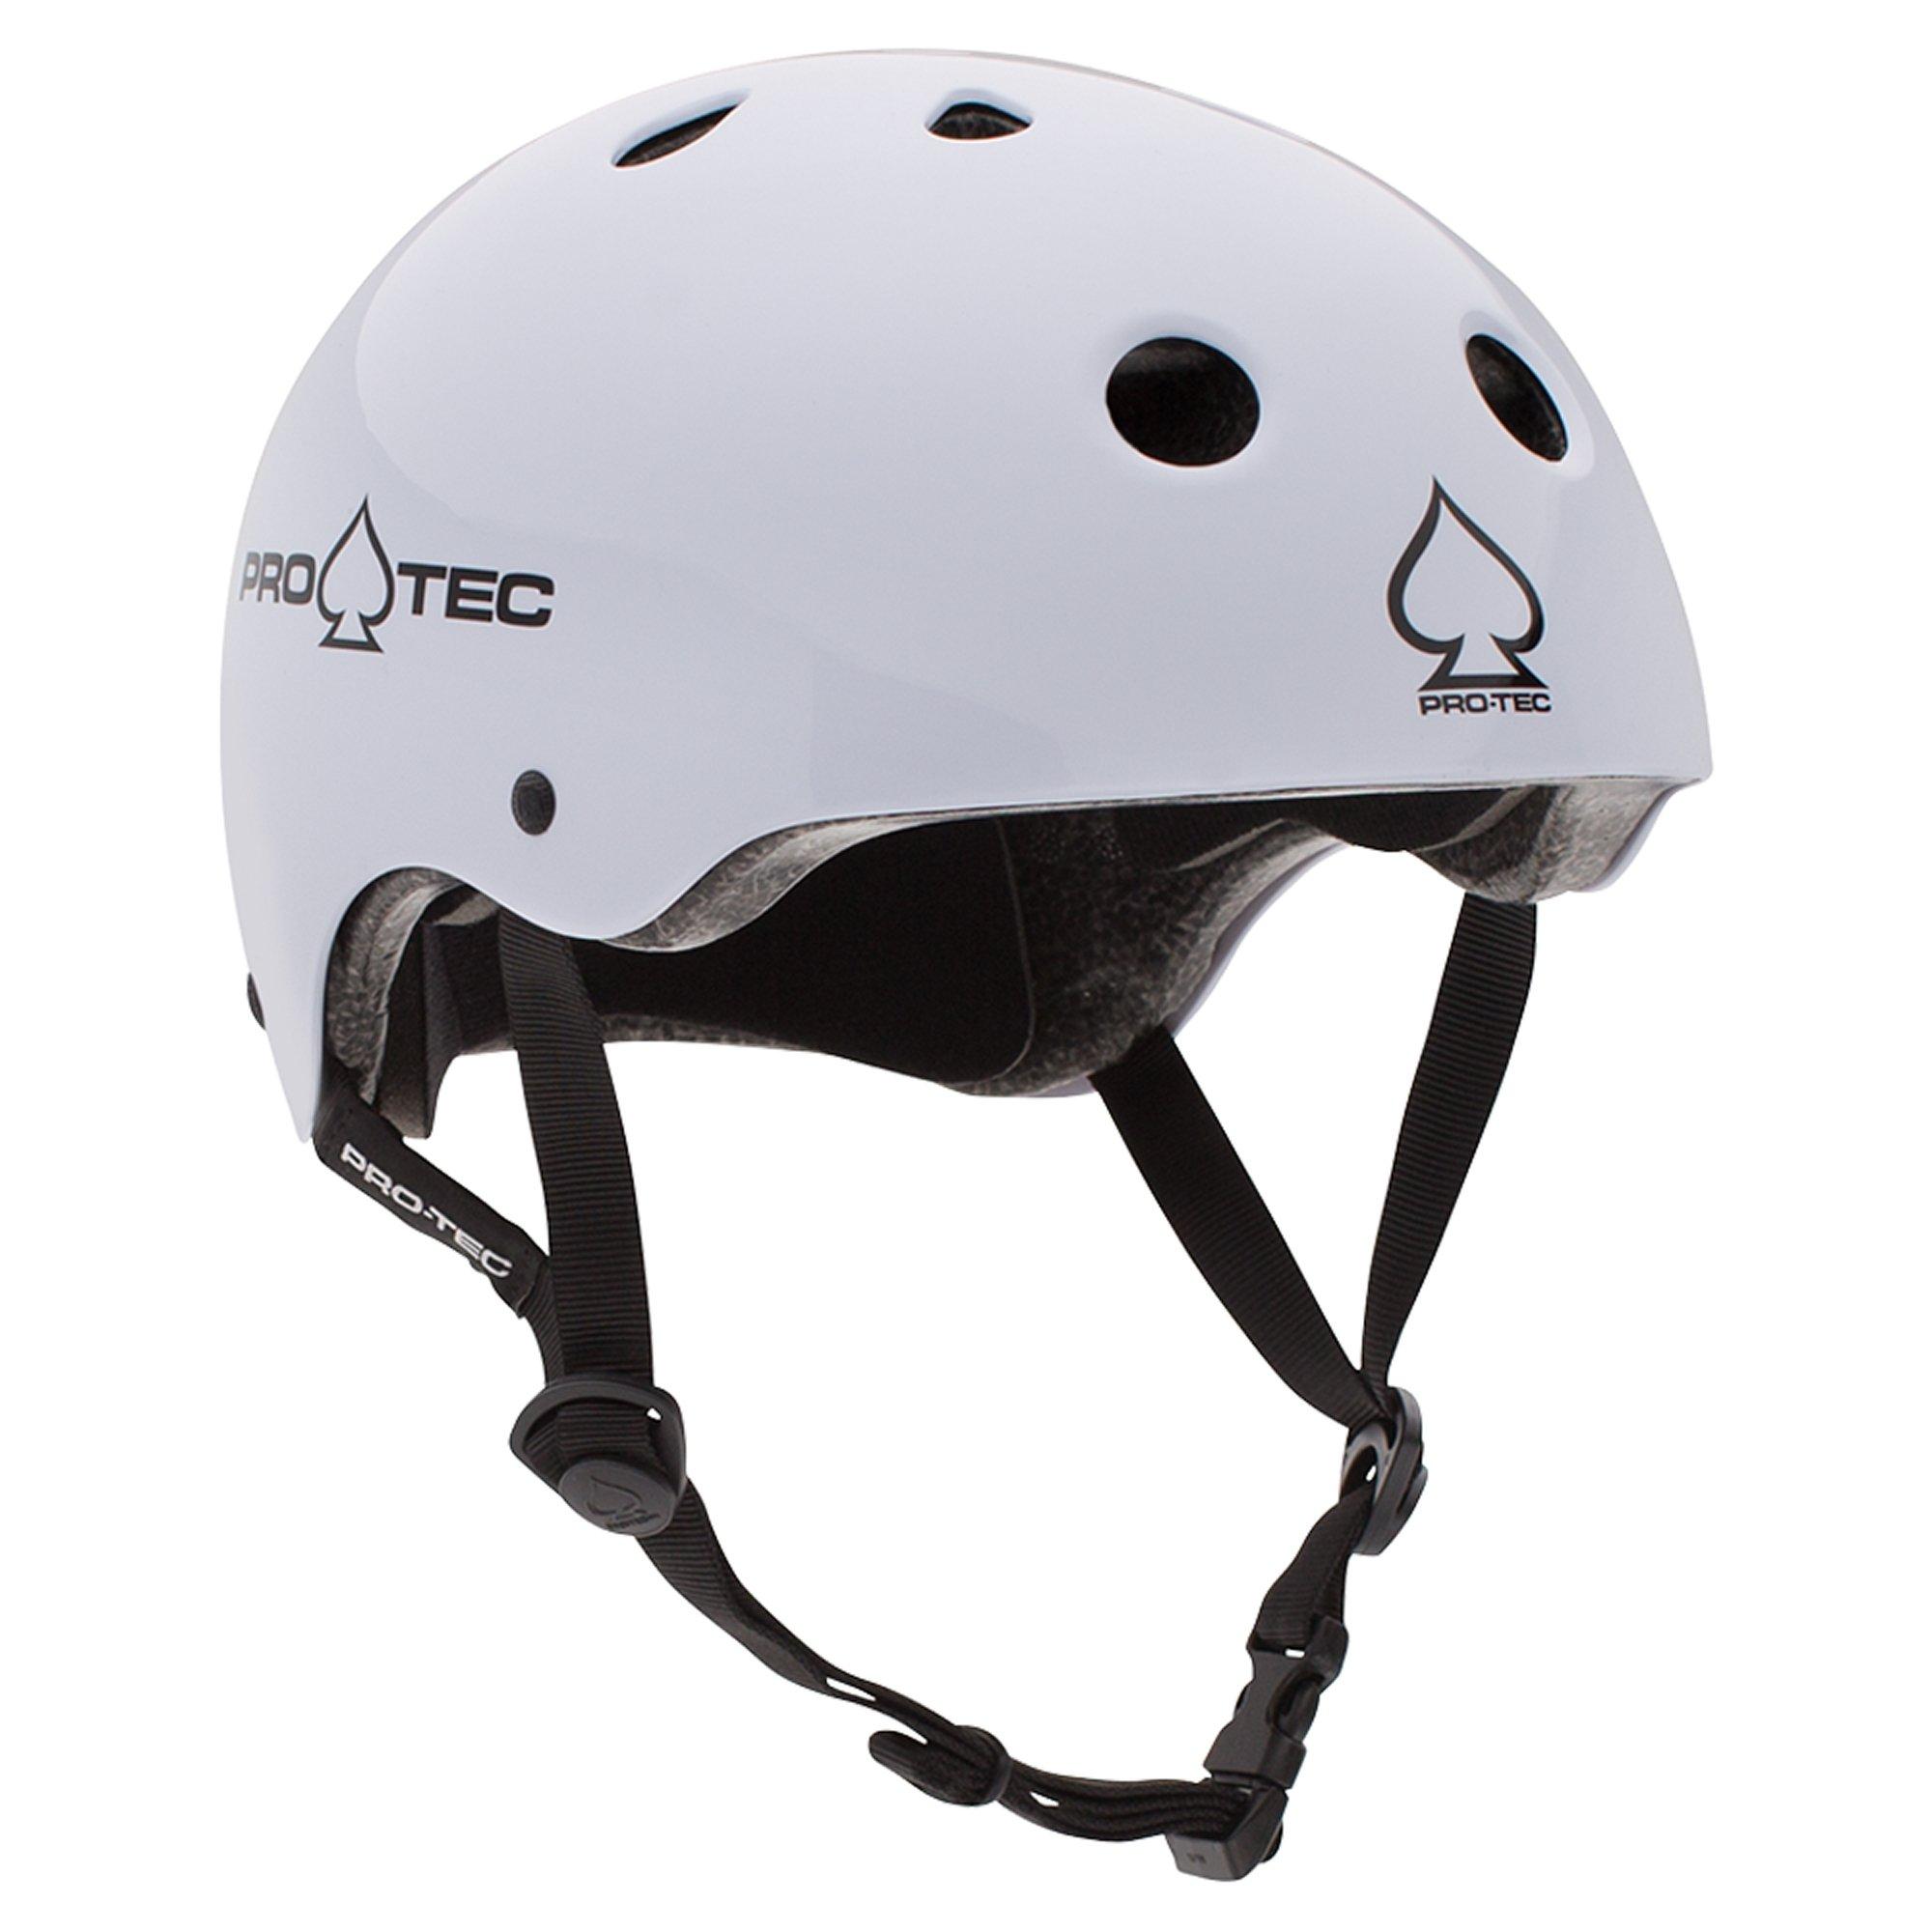 Pro-Tec Classic Certified Skate Helmet by Pro-Tec